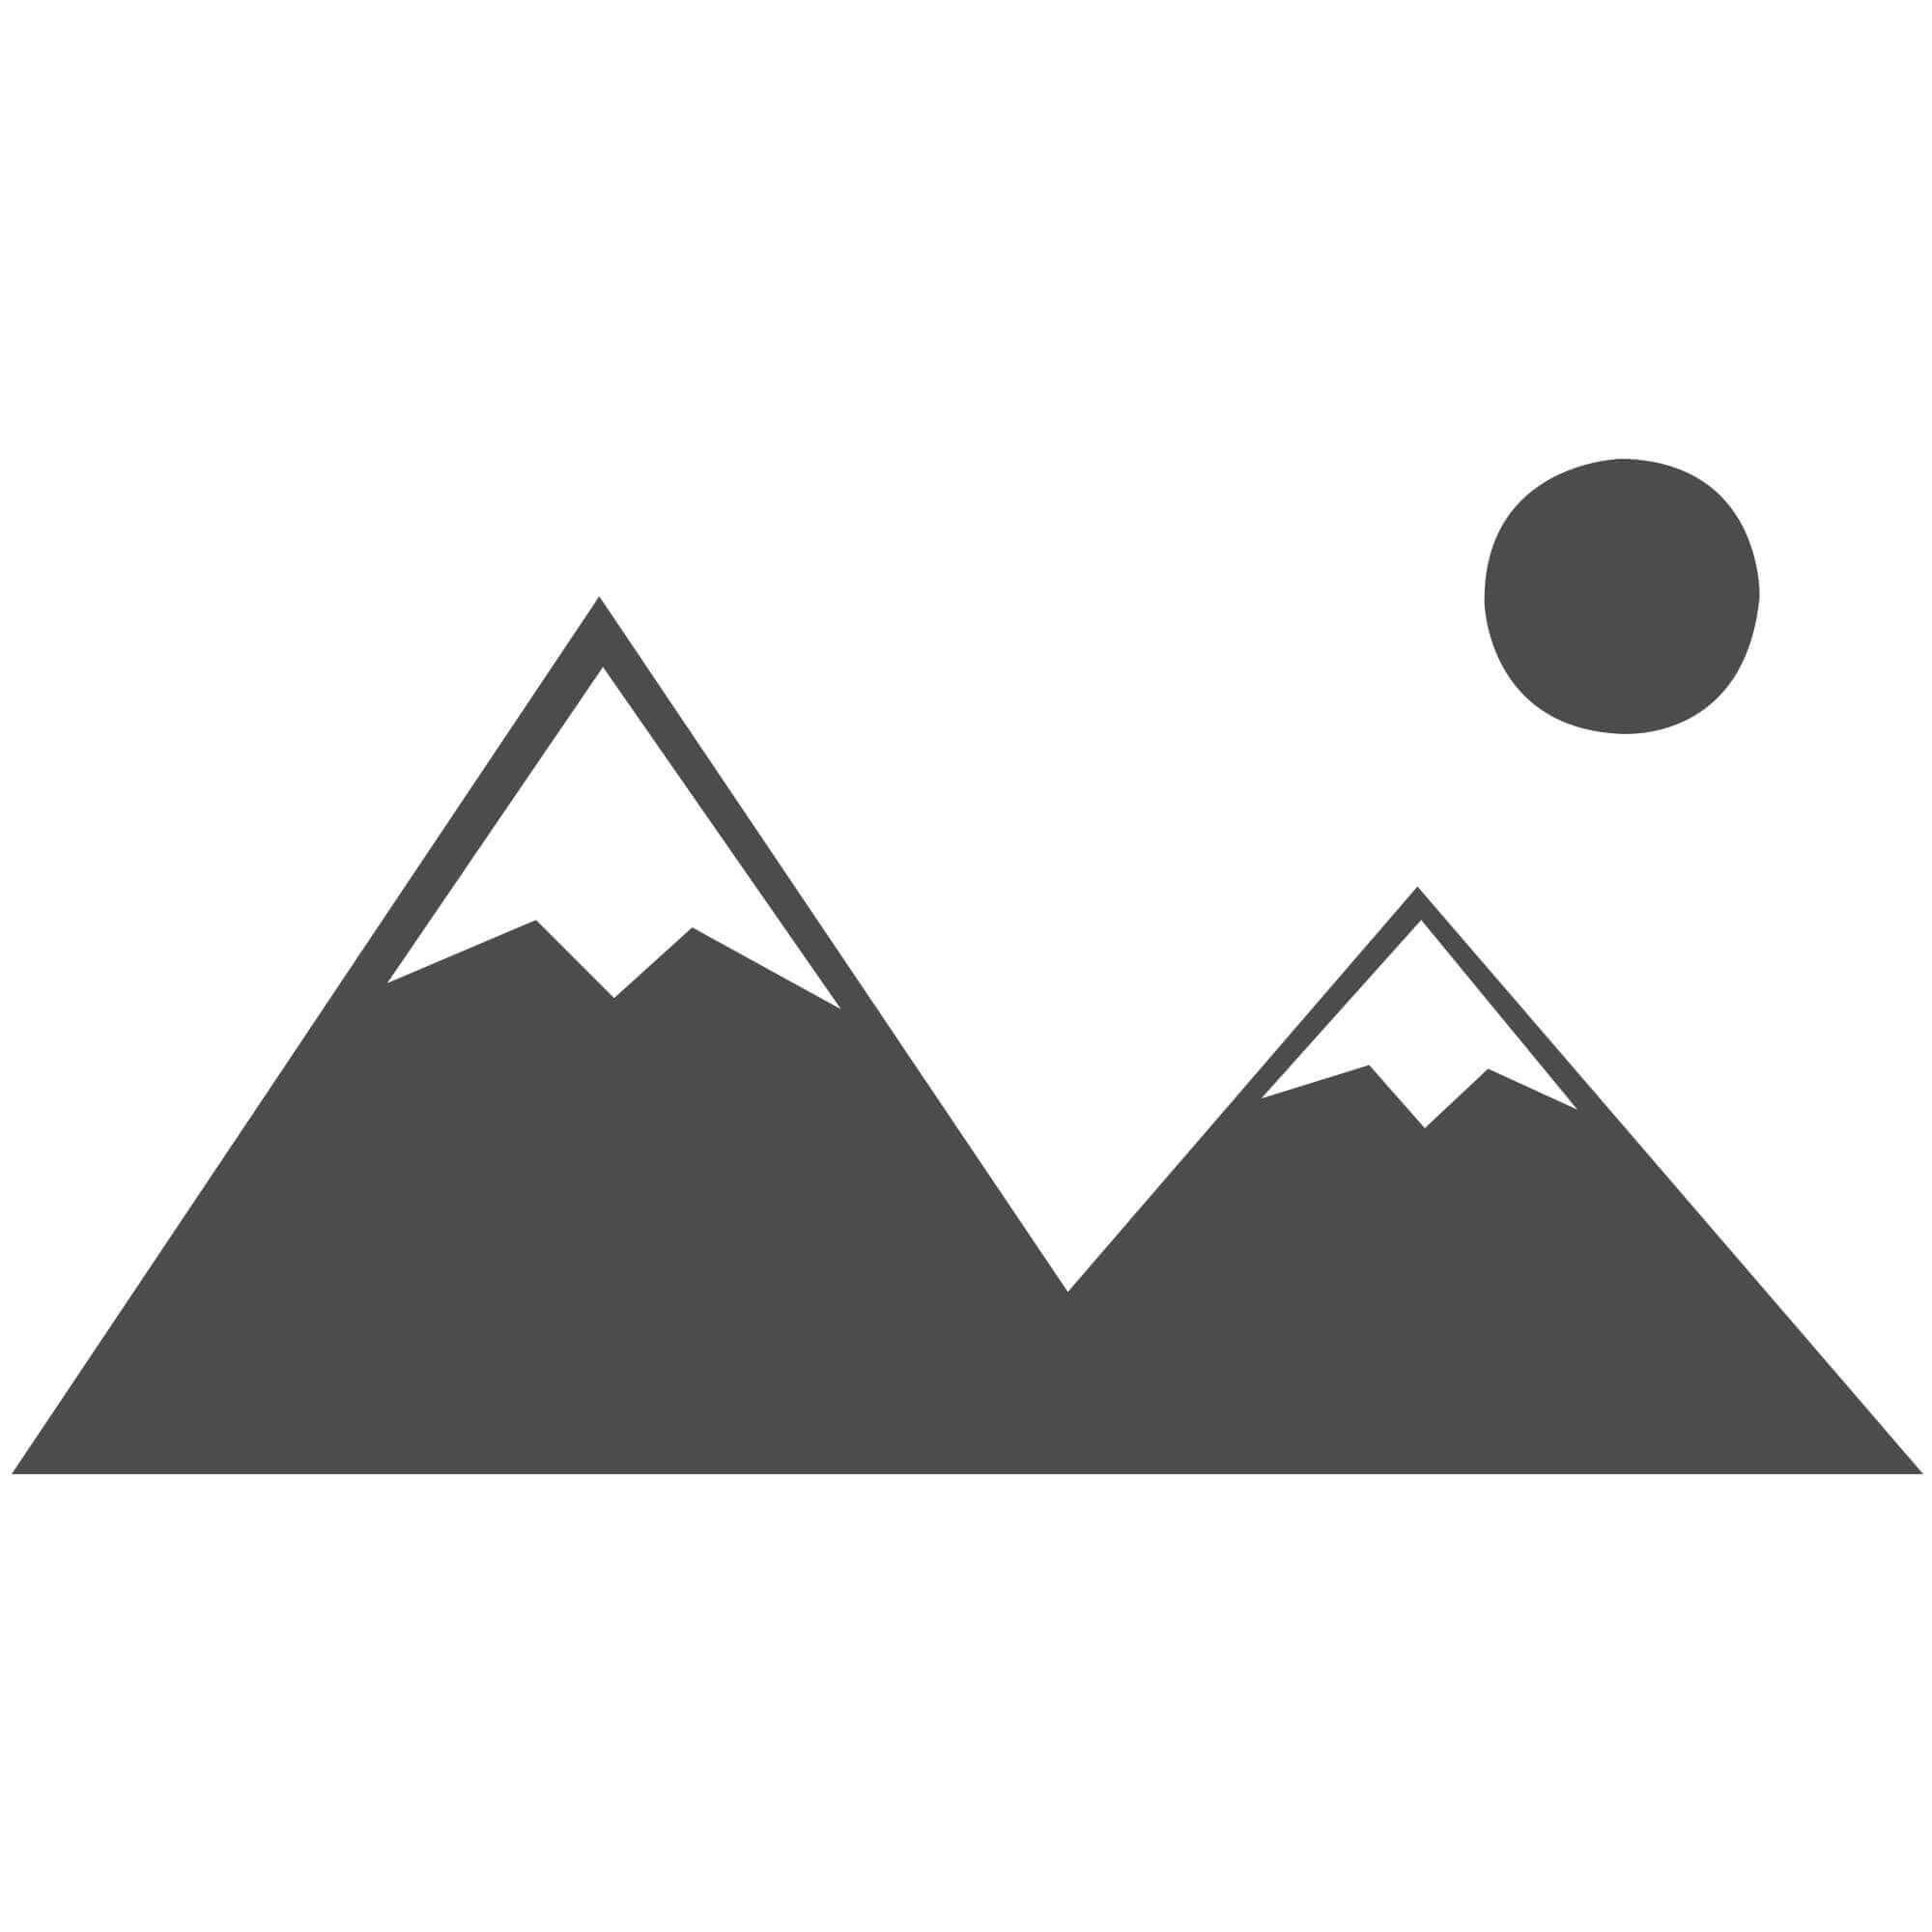 "Spectrum Dynamic Multi Rug - Size 120 x 170 cm (4' x 5'7"")"